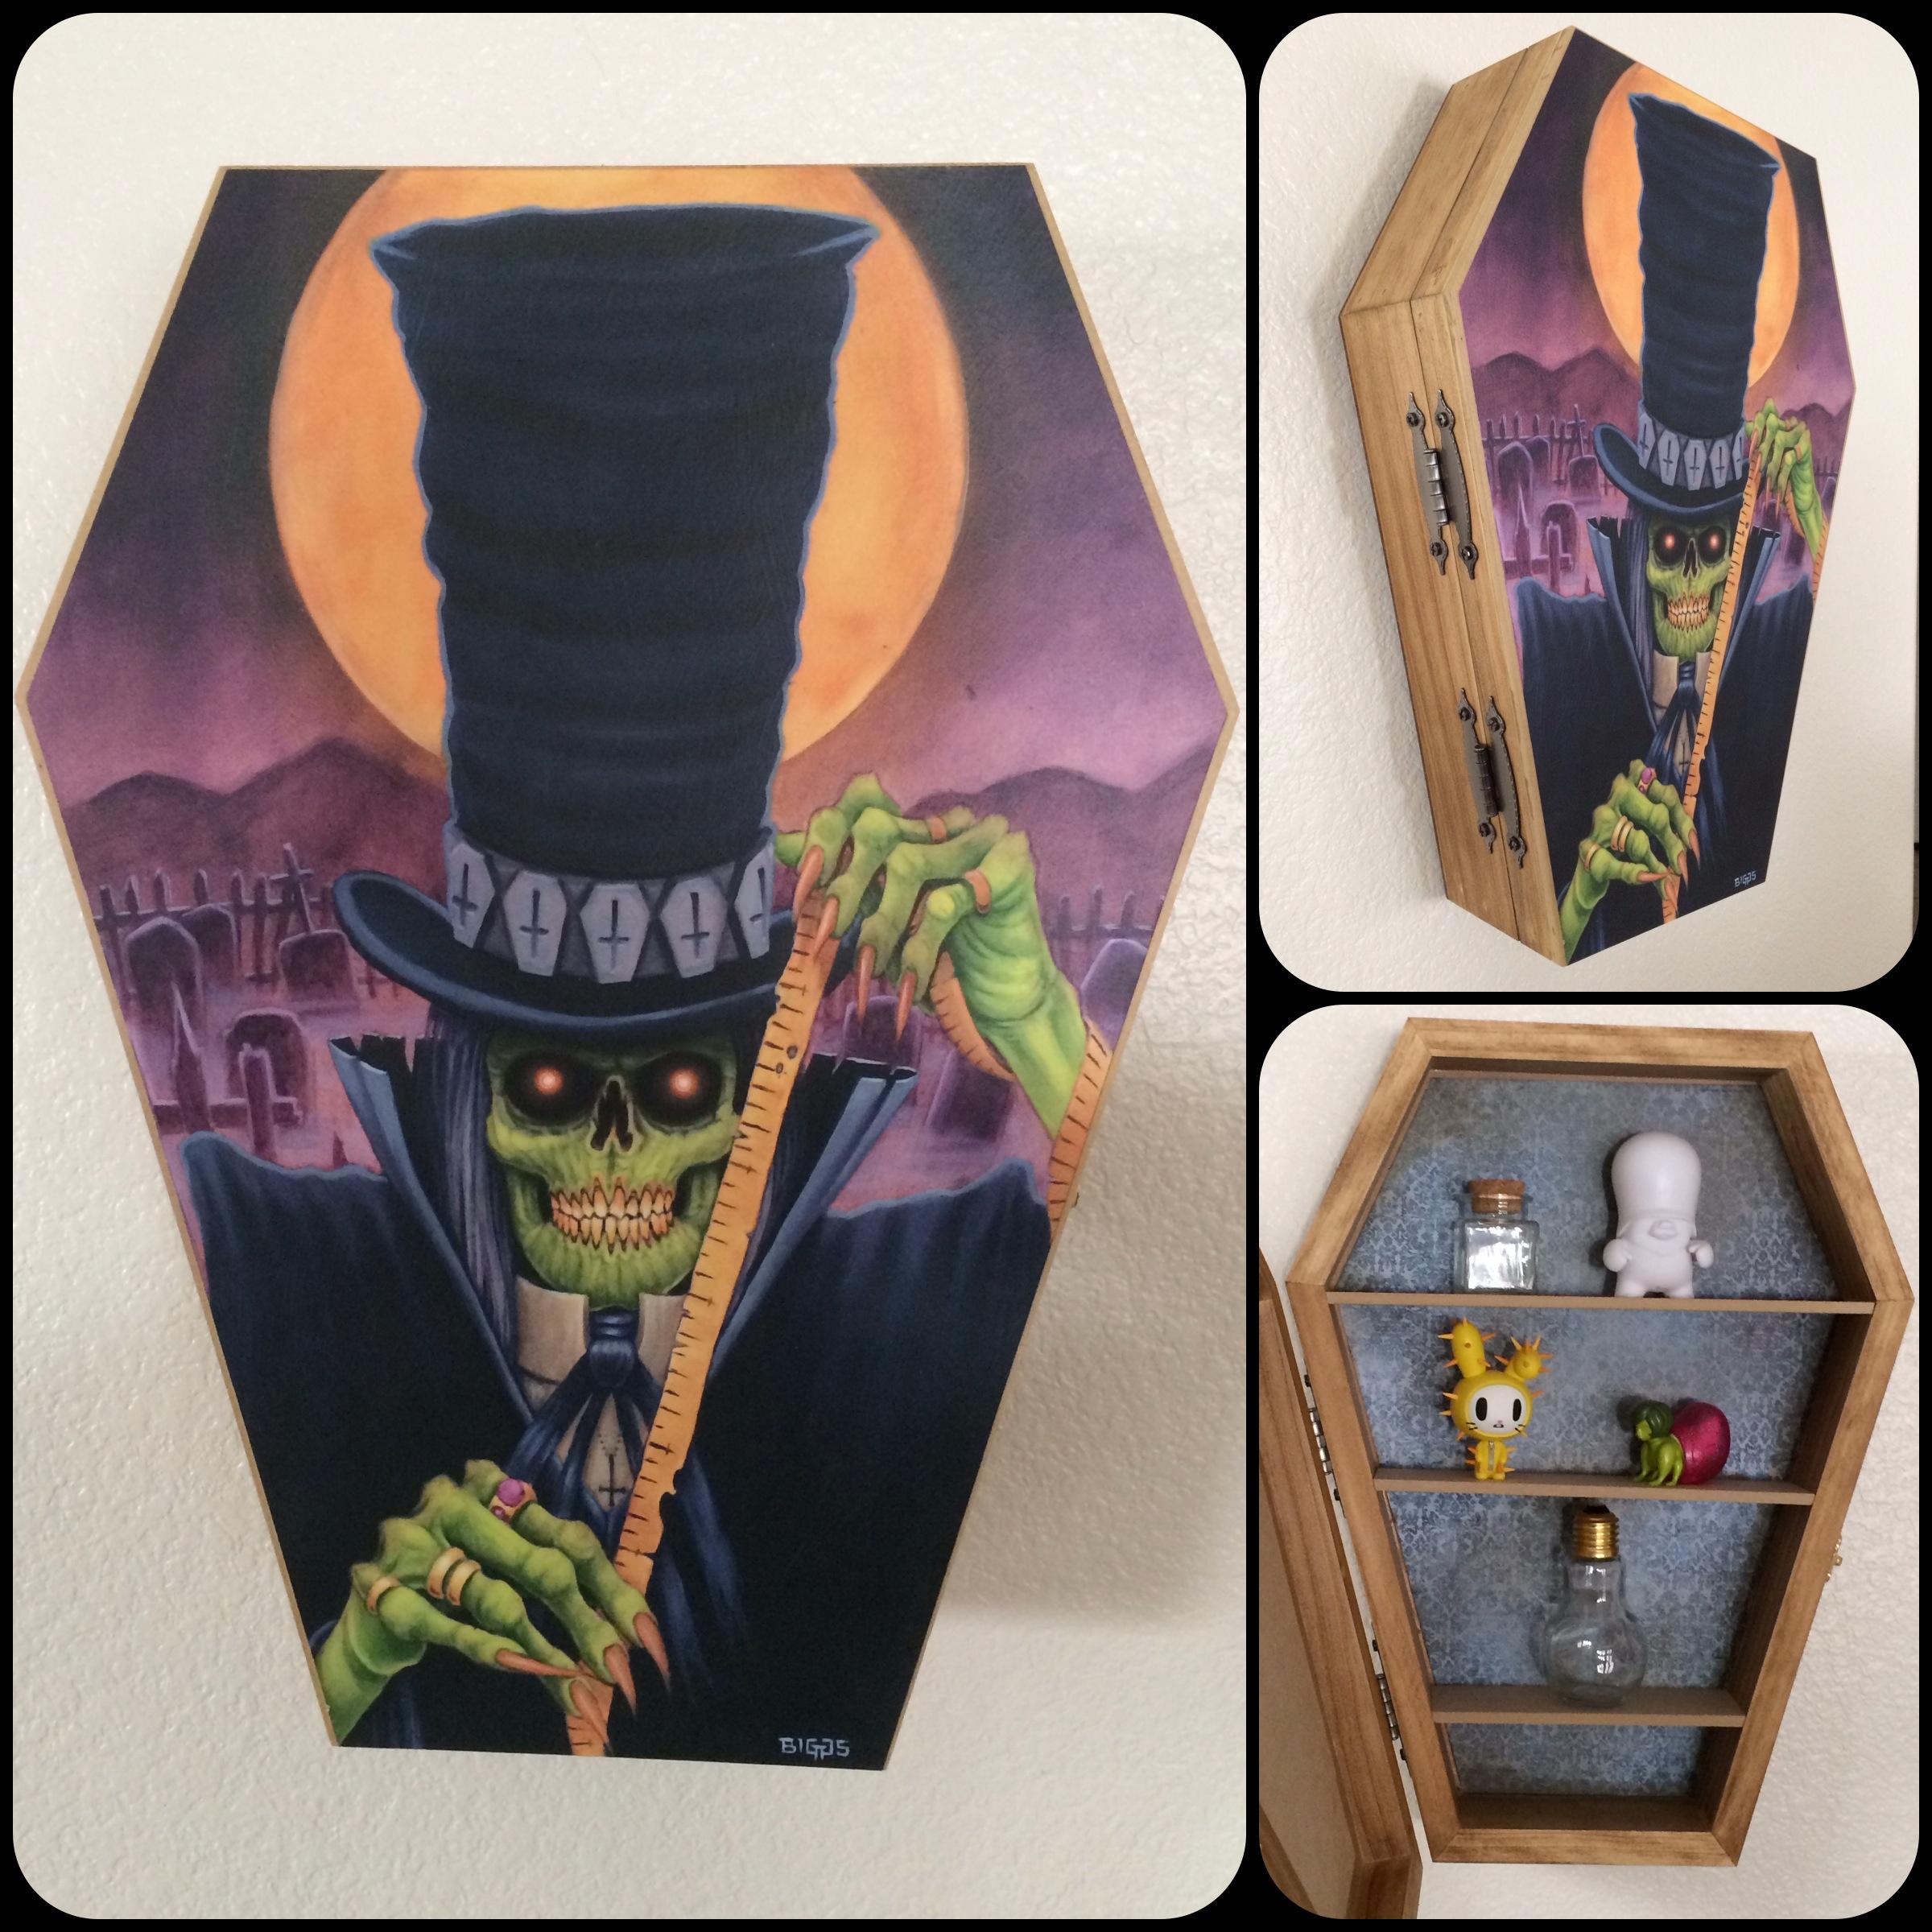 undertaker coffin shelf web.JPG